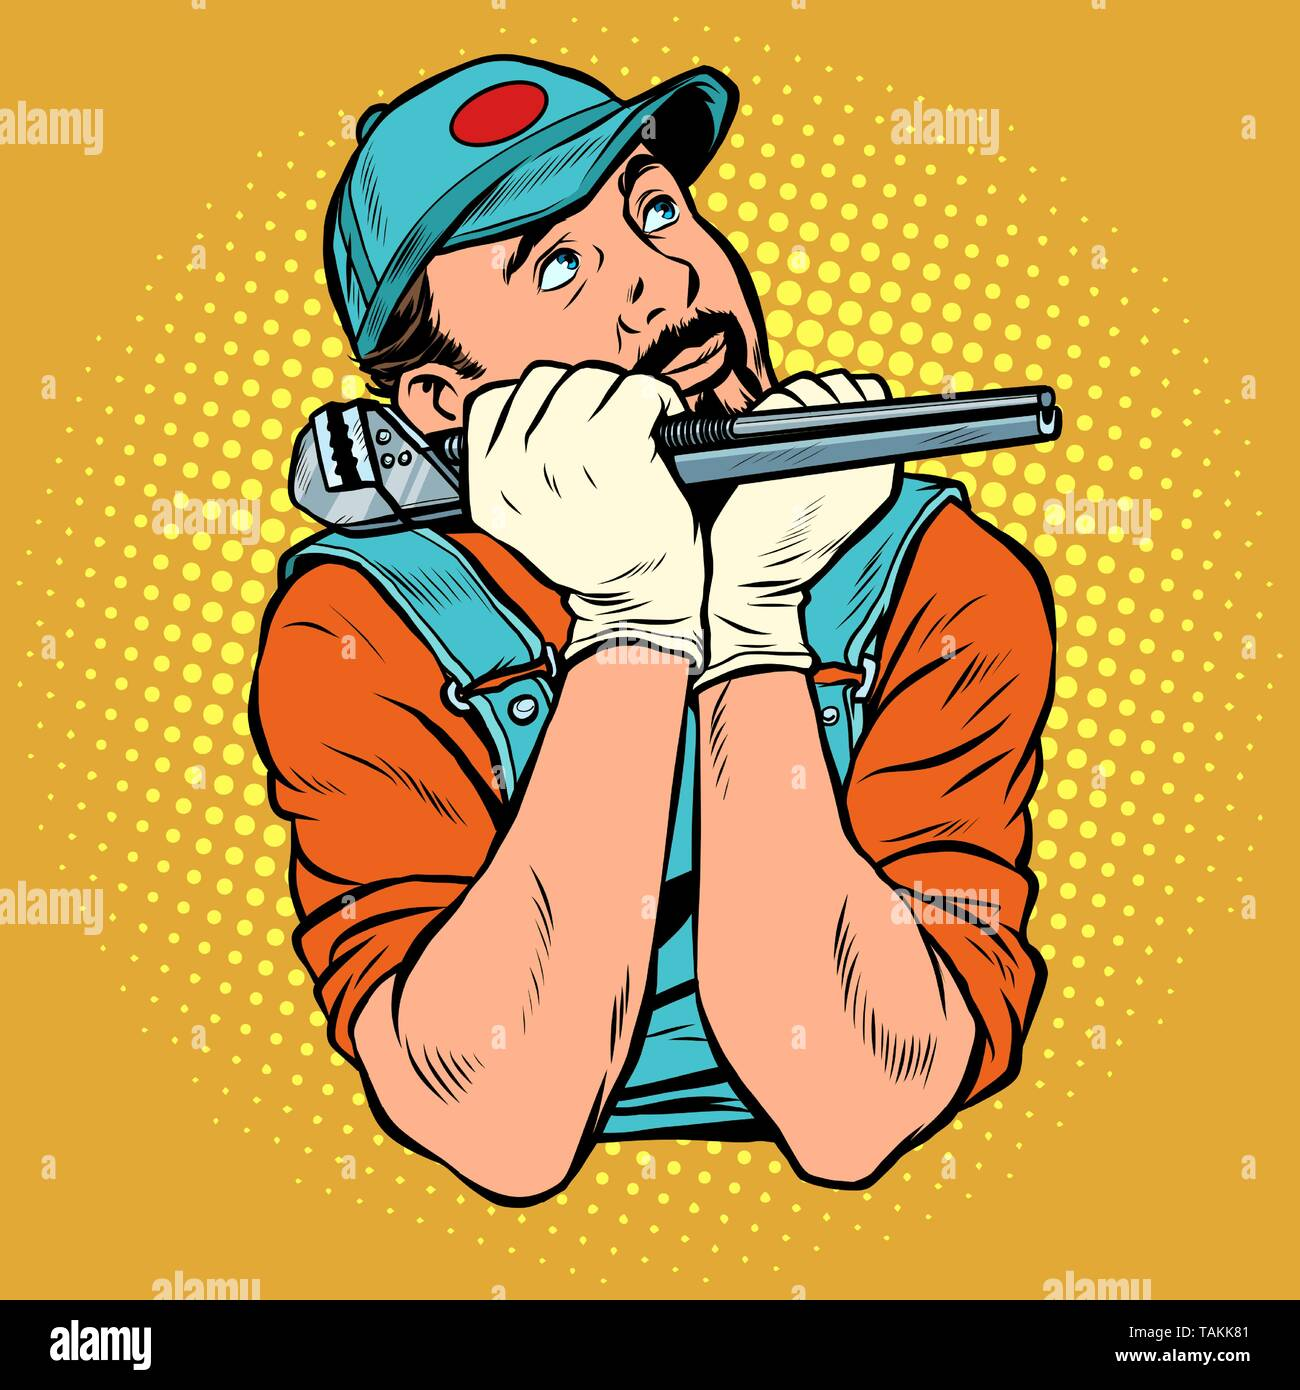 plumber with wrench dreamer thinks. Pop art retro vector illustration vintage kitsch - Stock Image